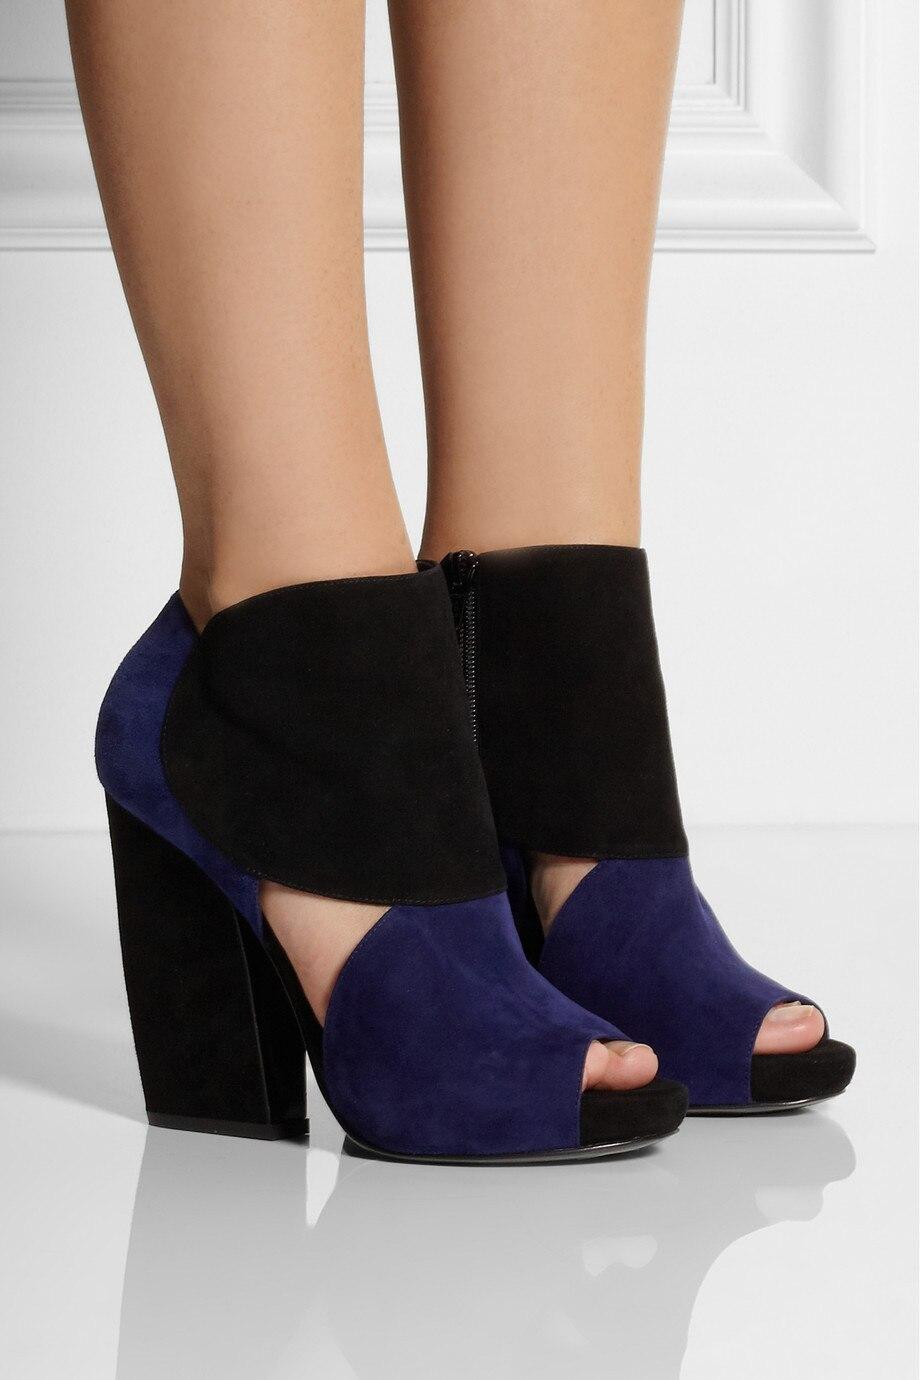 Popular Navy Blue Heels-Buy Cheap Navy Blue Heels lots from China